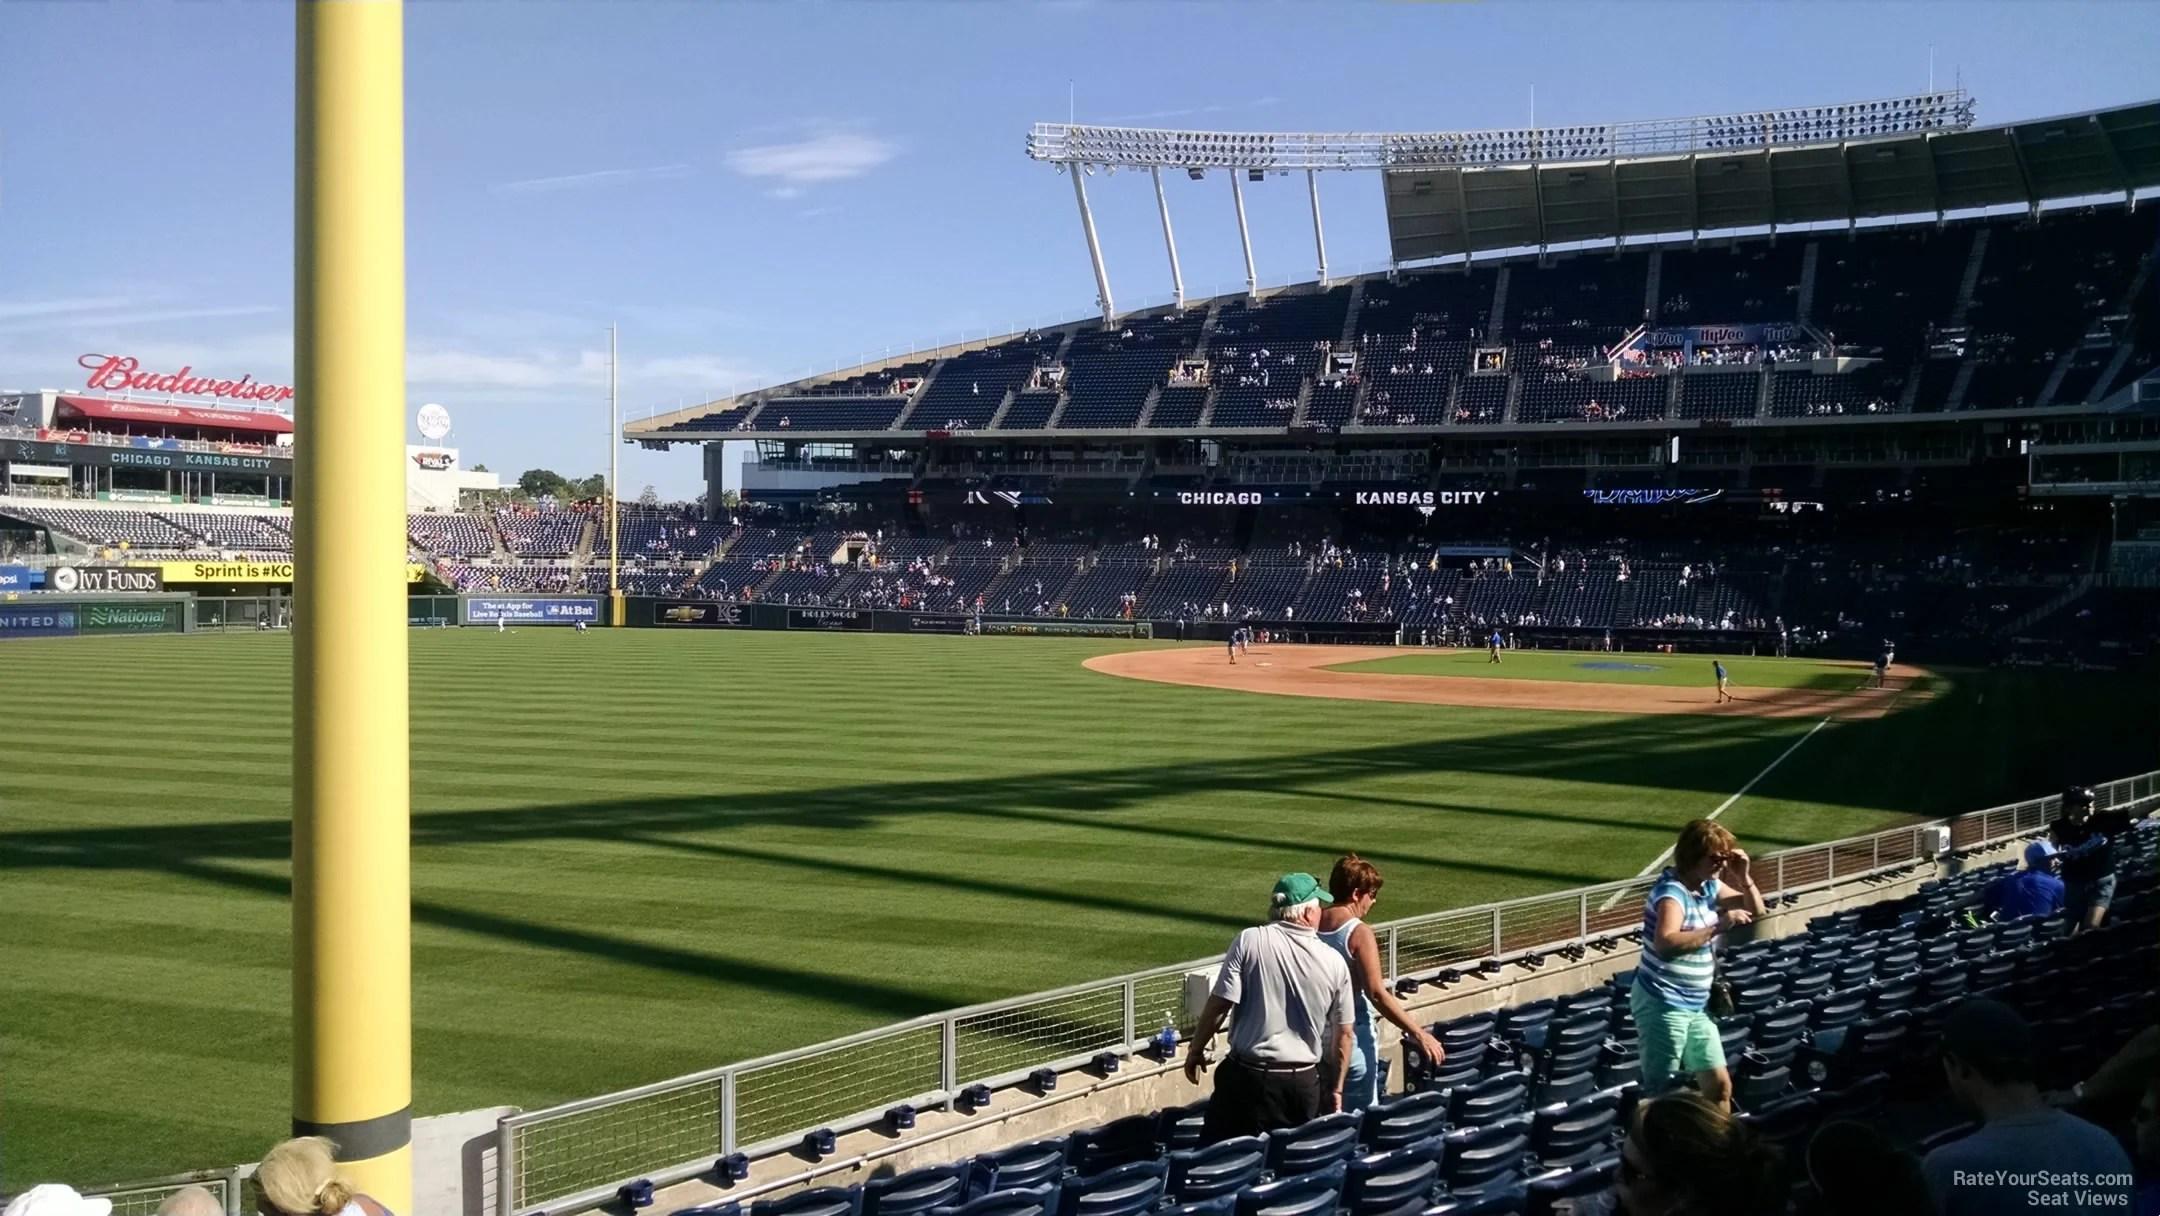 Kansas City Royals Seating View